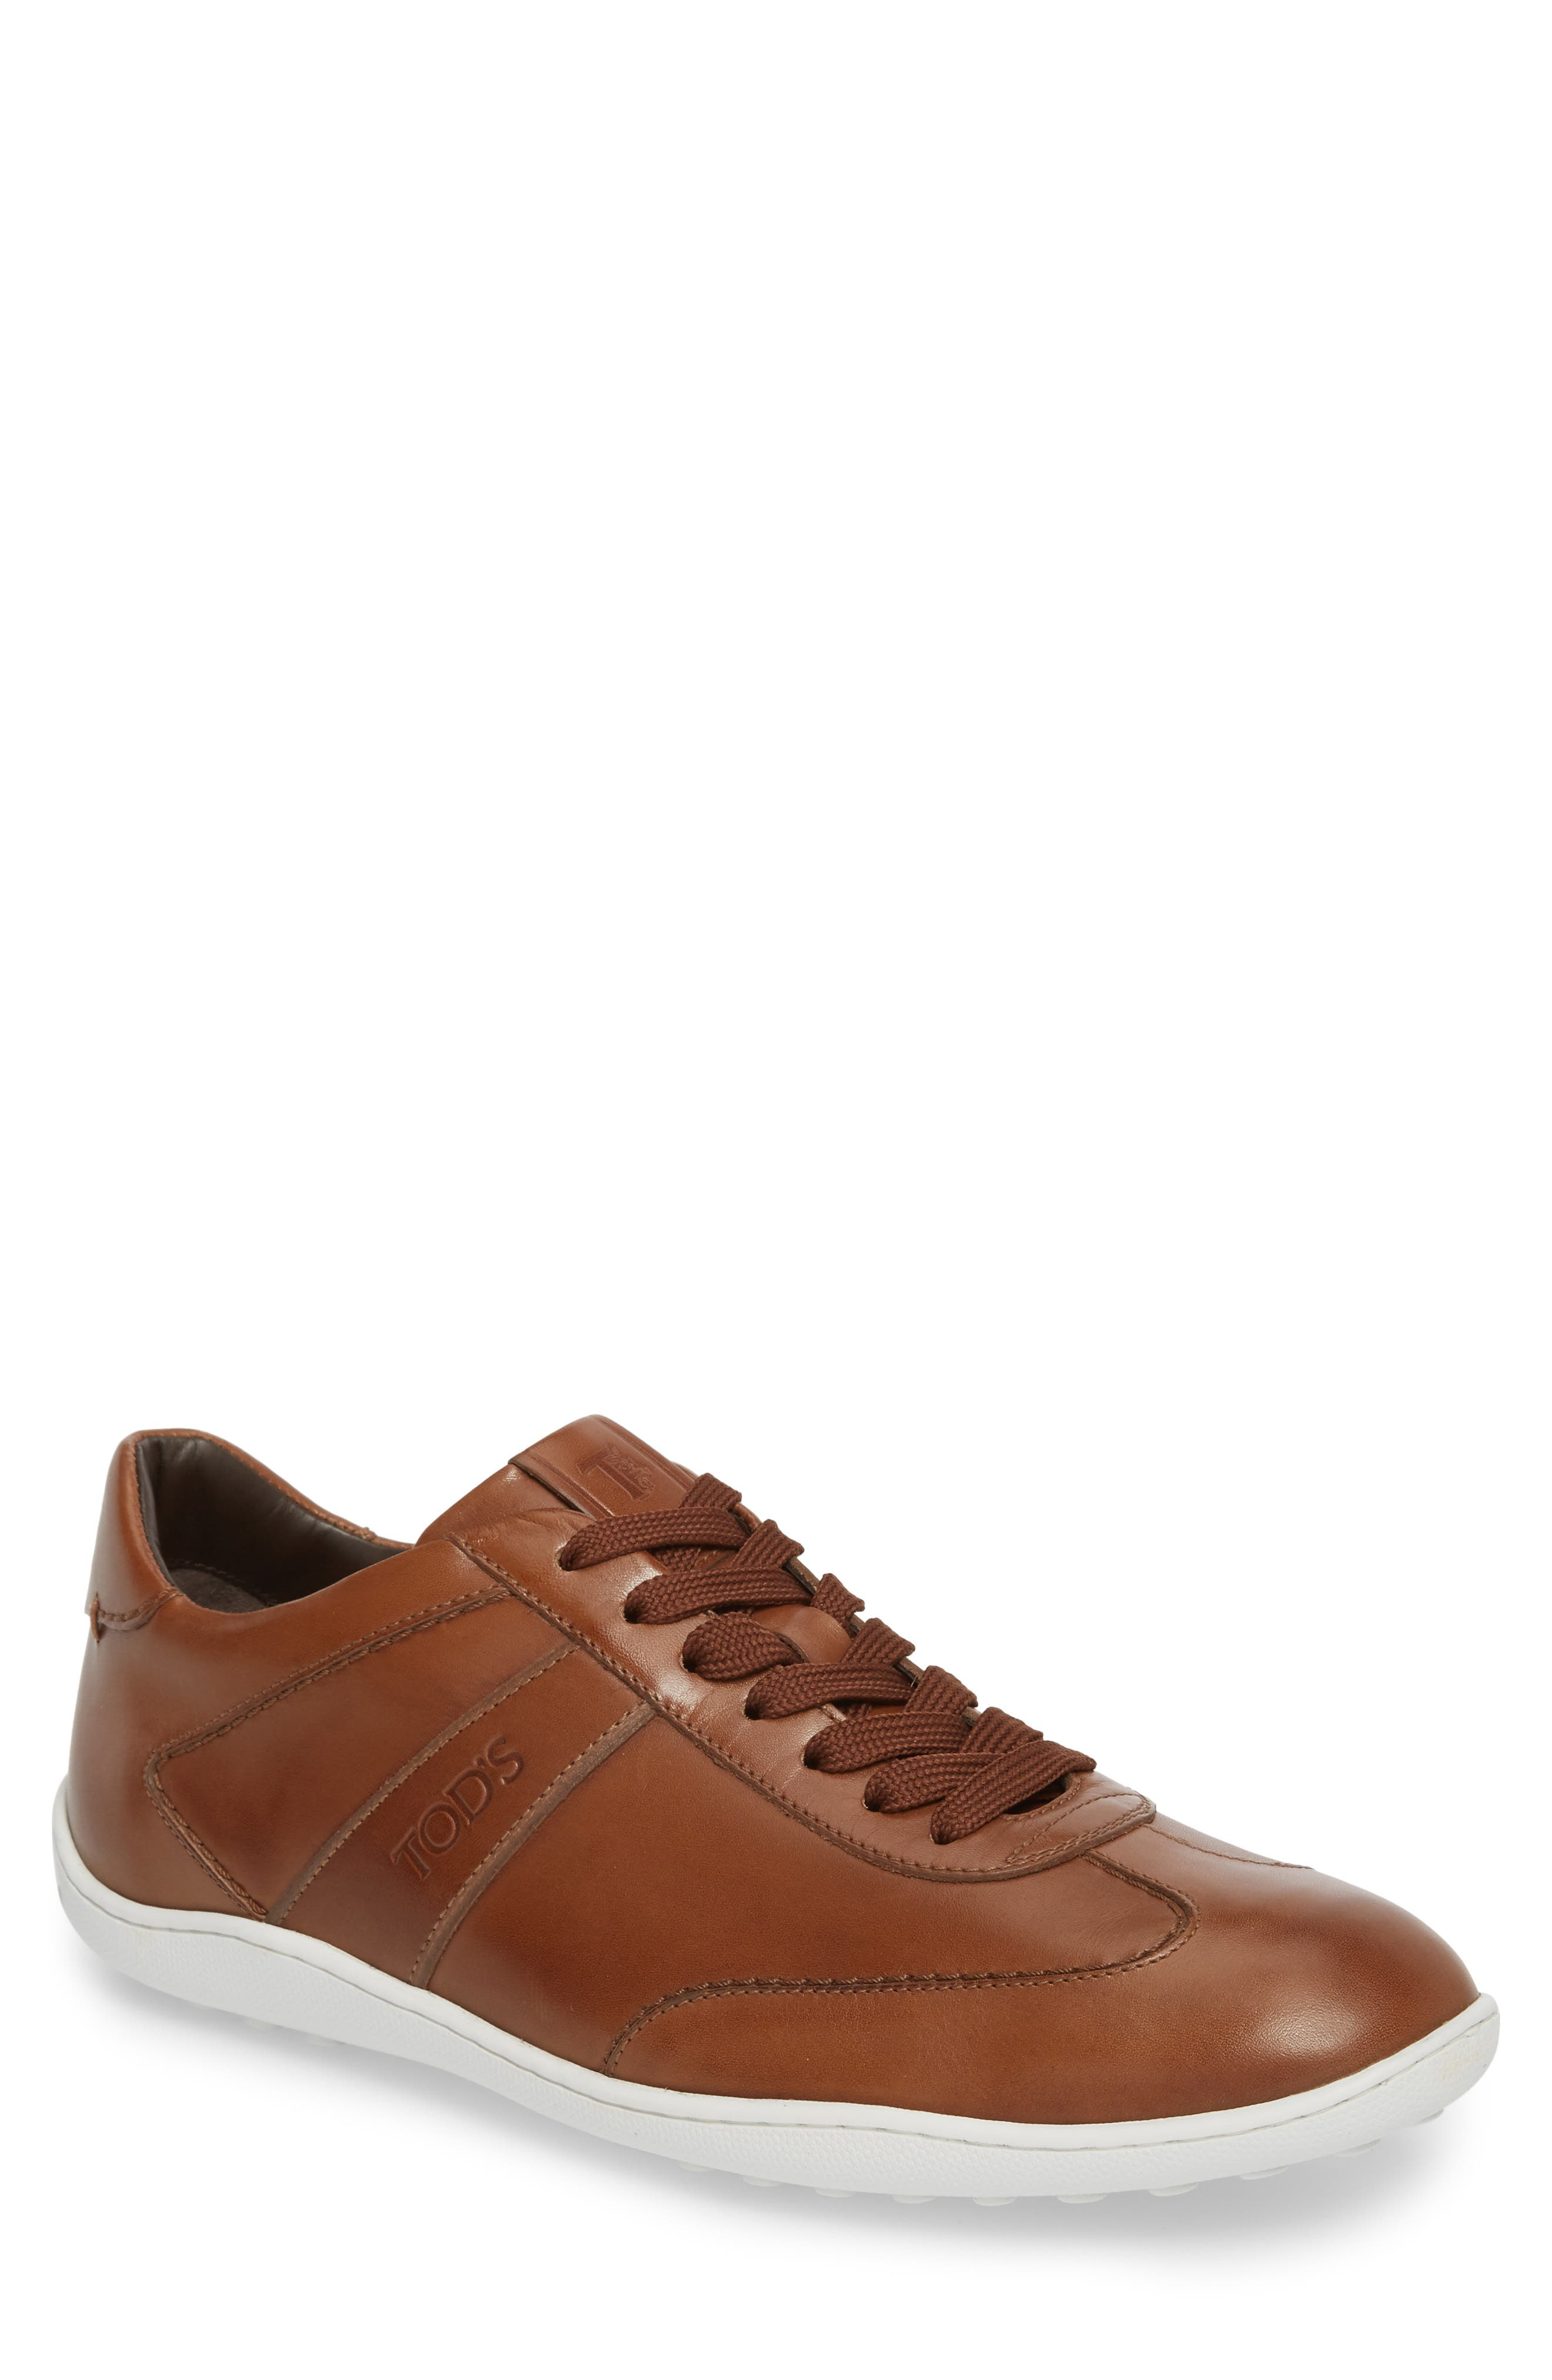 Alternate Image 1 Selected - Tod's Owen Sneaker (Men)